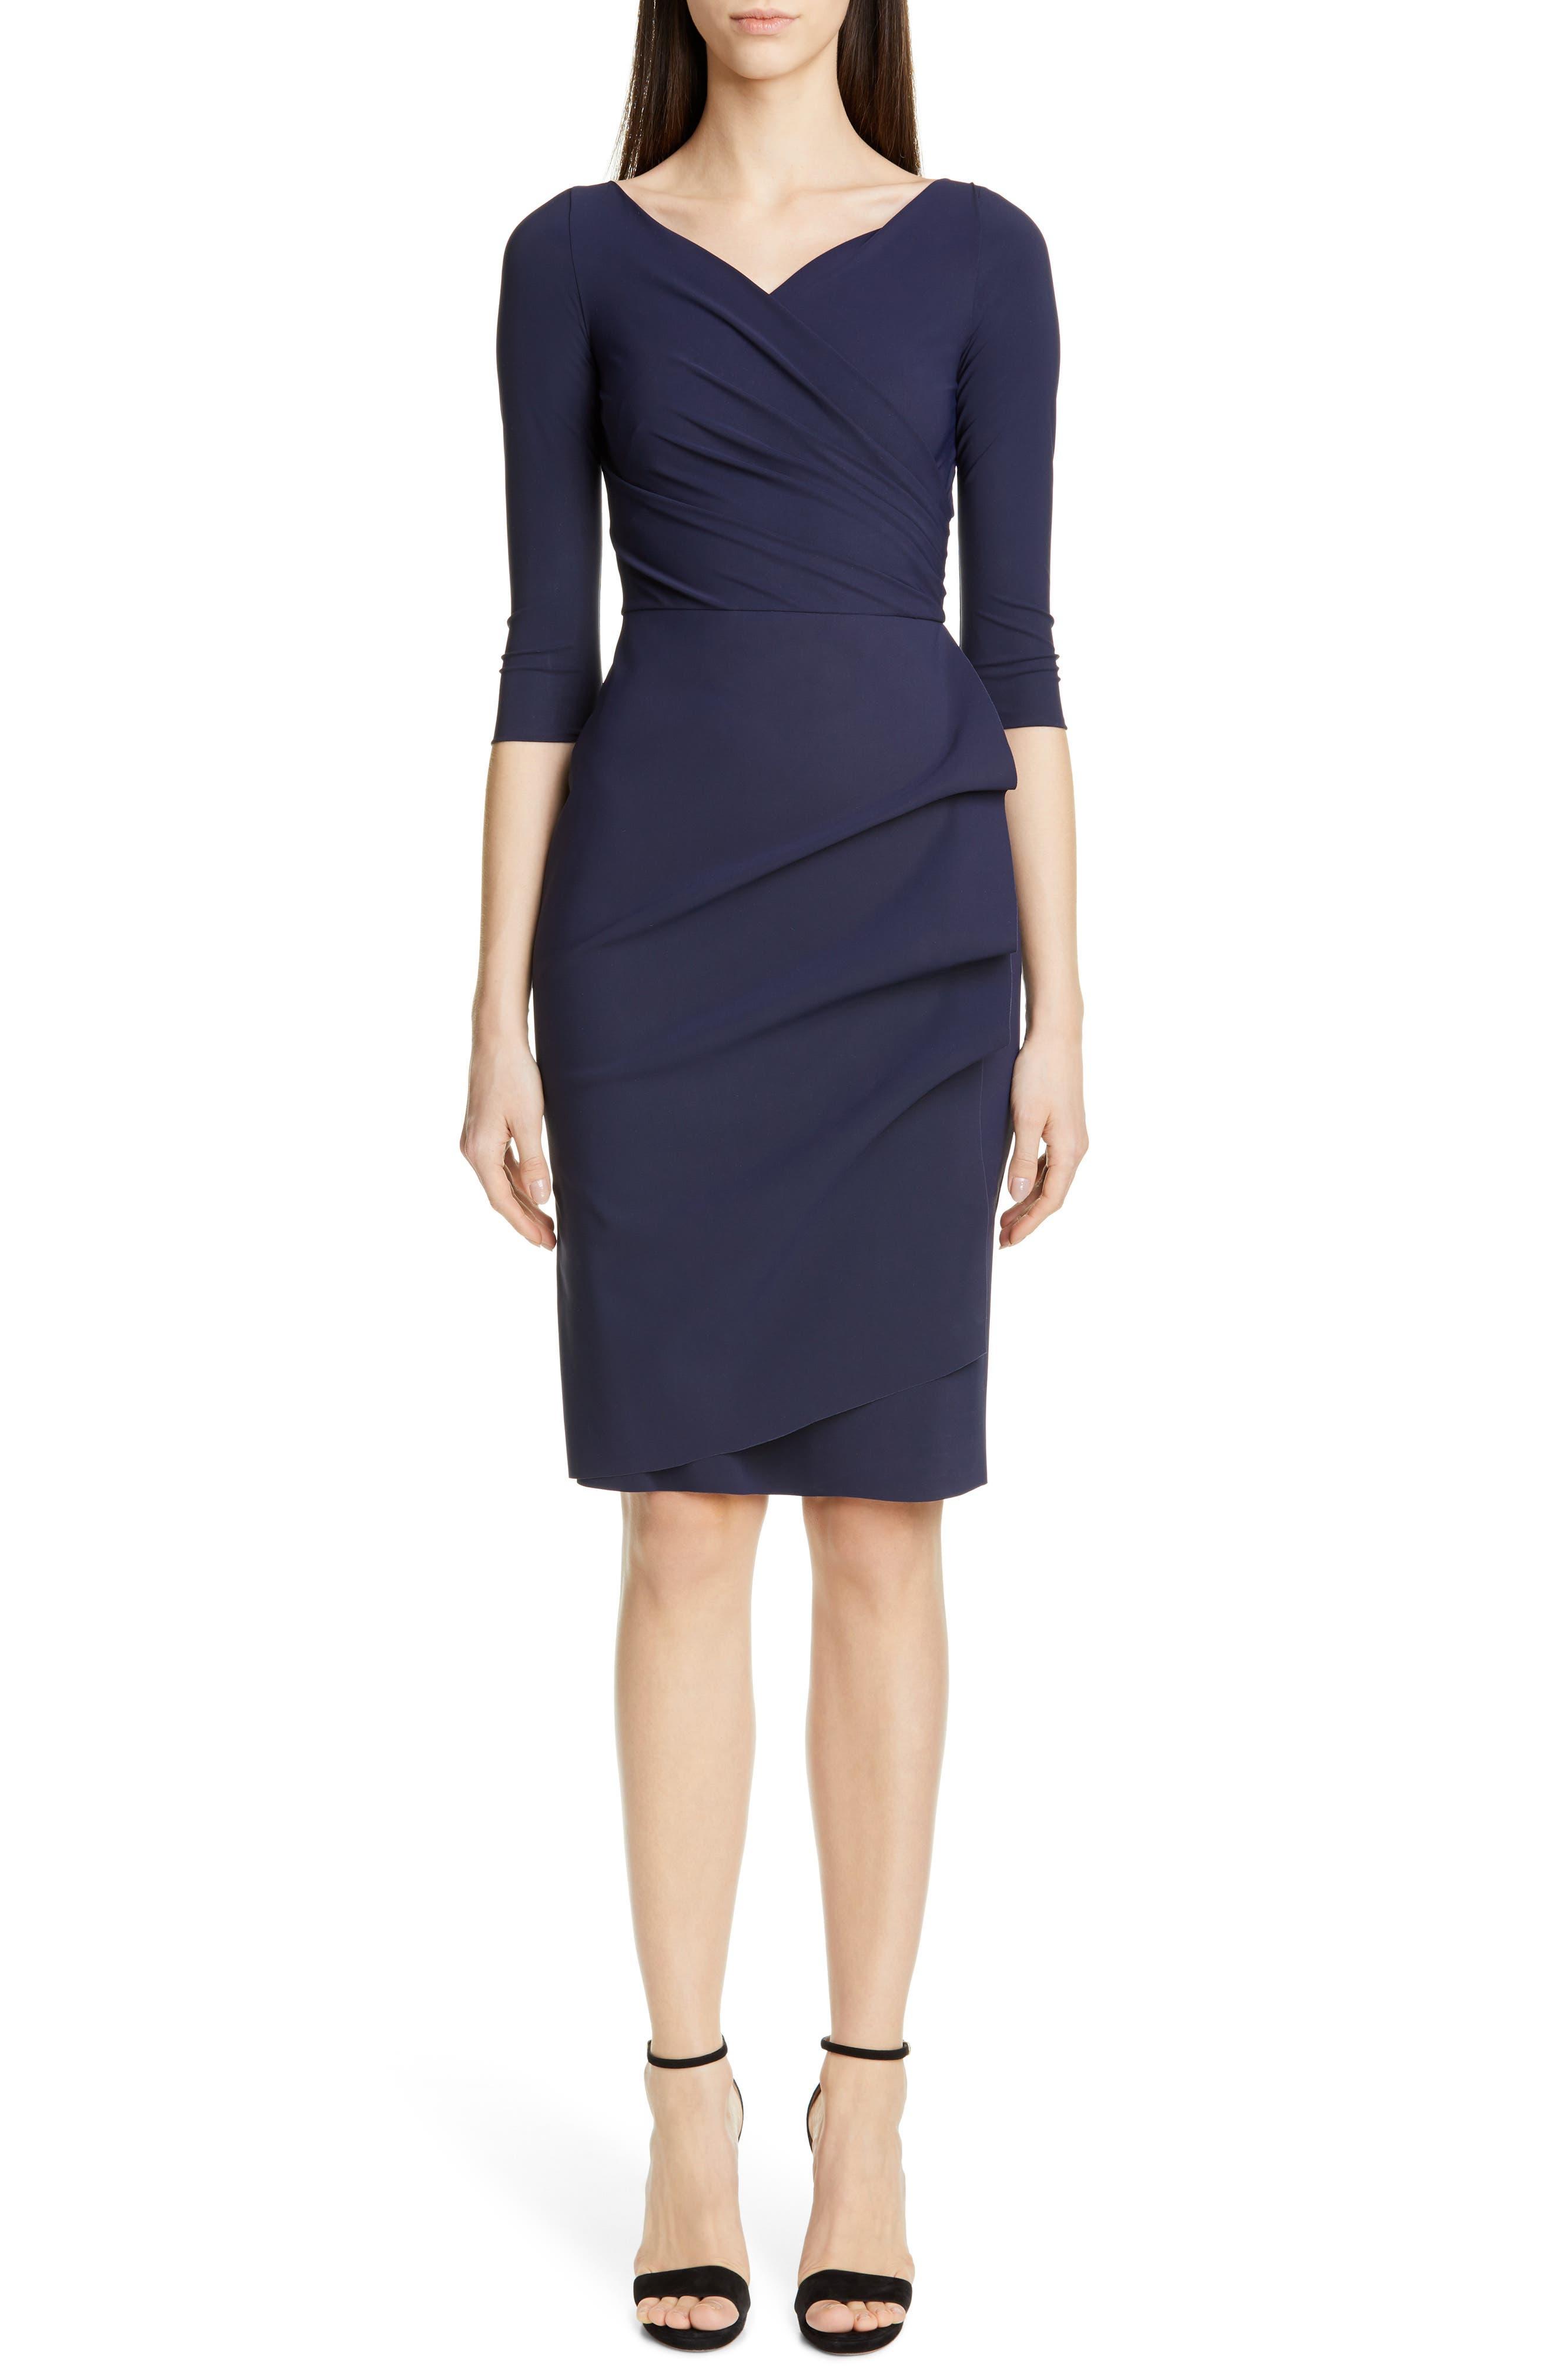 Chiara Boni La Petite Robe Florien Ruched Cocktail Dress, 6 IT - Blue